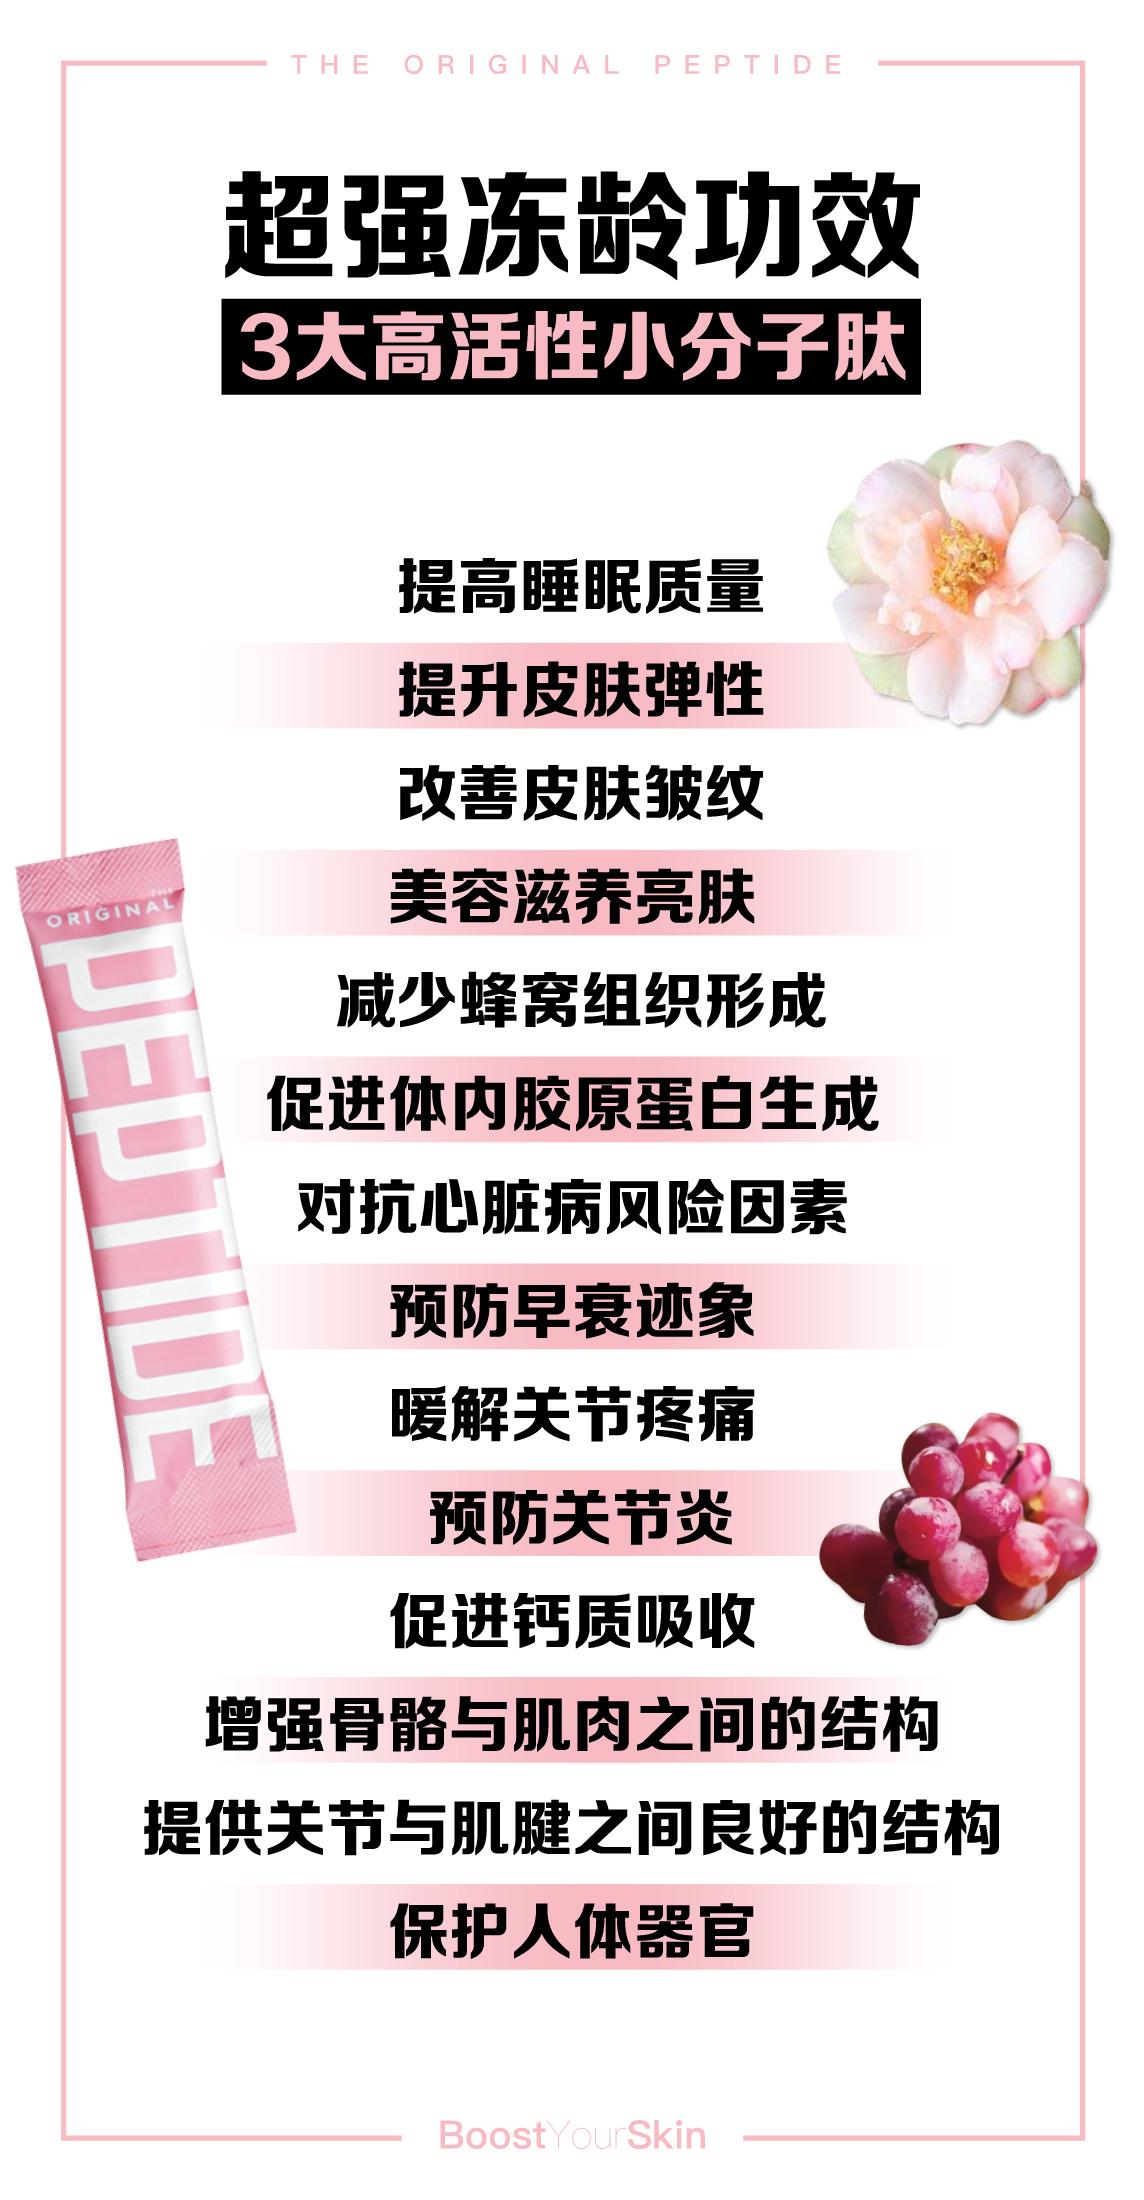 The Original Peptide 胶原蛋白肽_功效